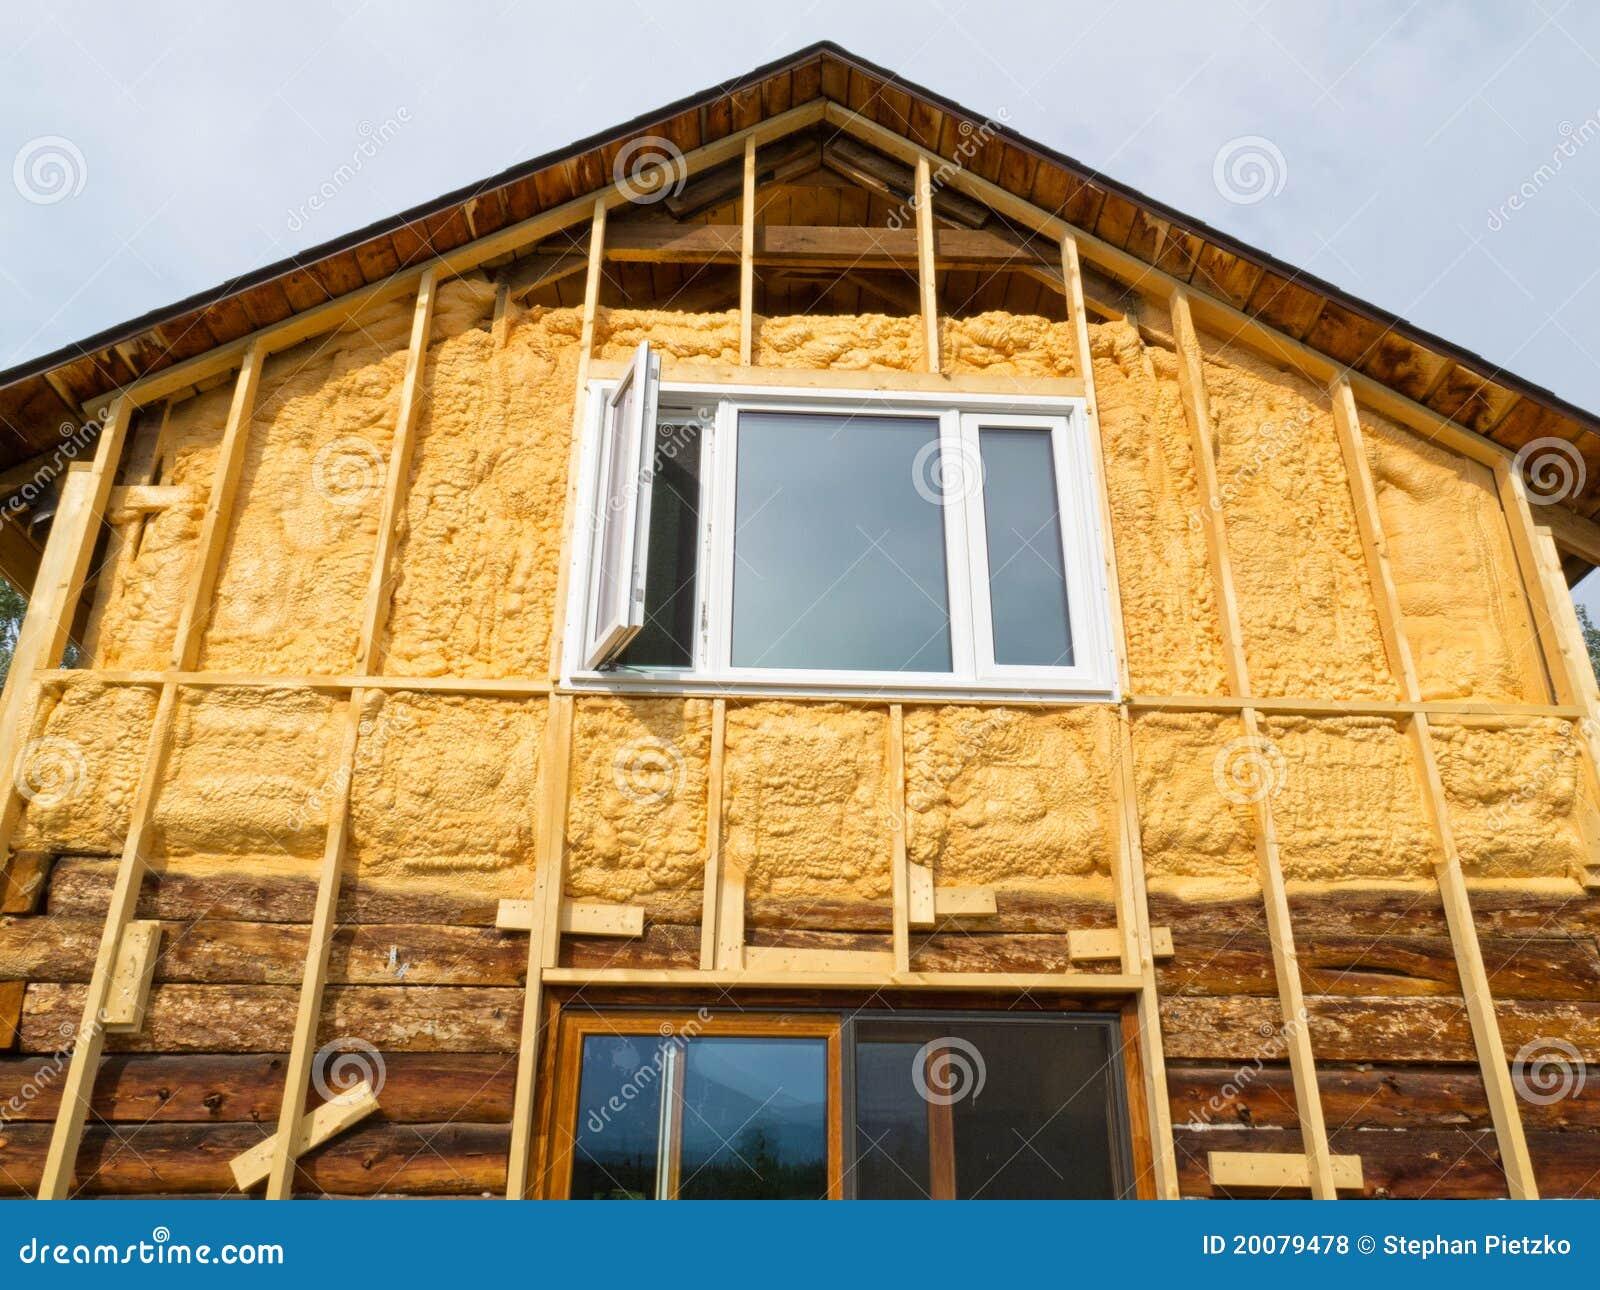 Spray foam insulation for house - Energy Foam House Insulation Liquid Renovation Spray